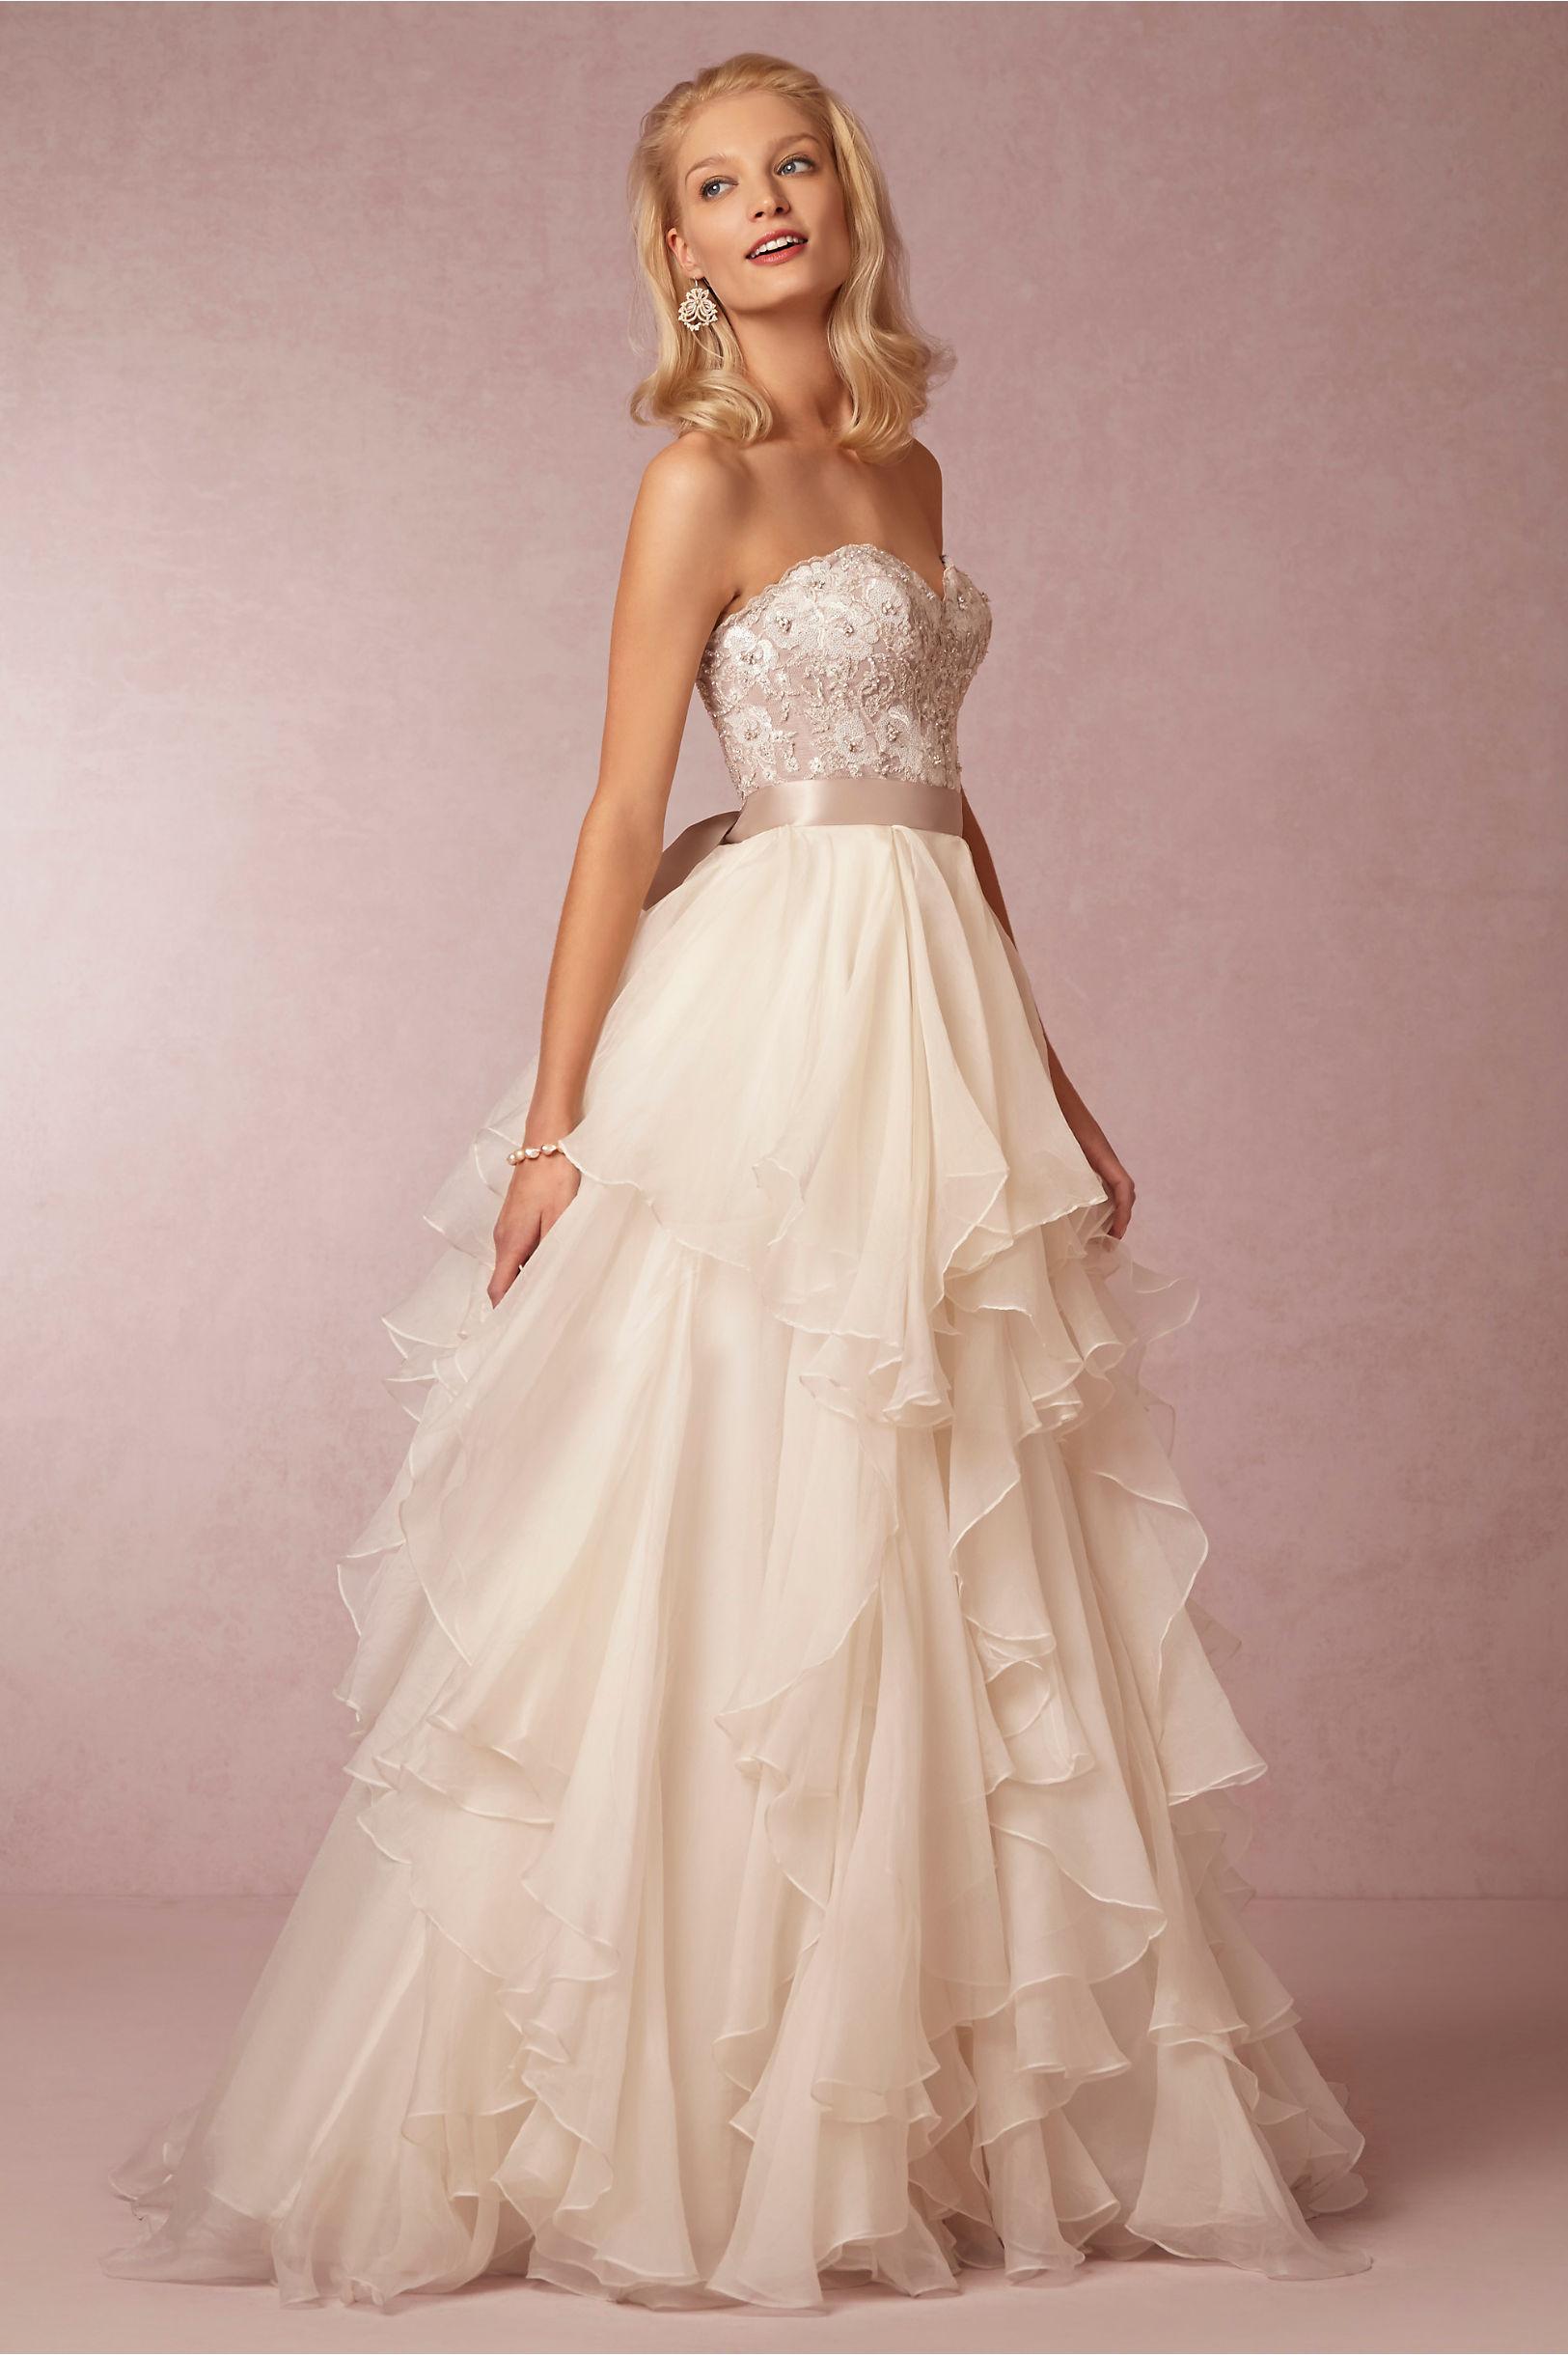 wedding dress corset and skirt corset style wedding dresses Maelin Corset Priya Skirt Bhldn